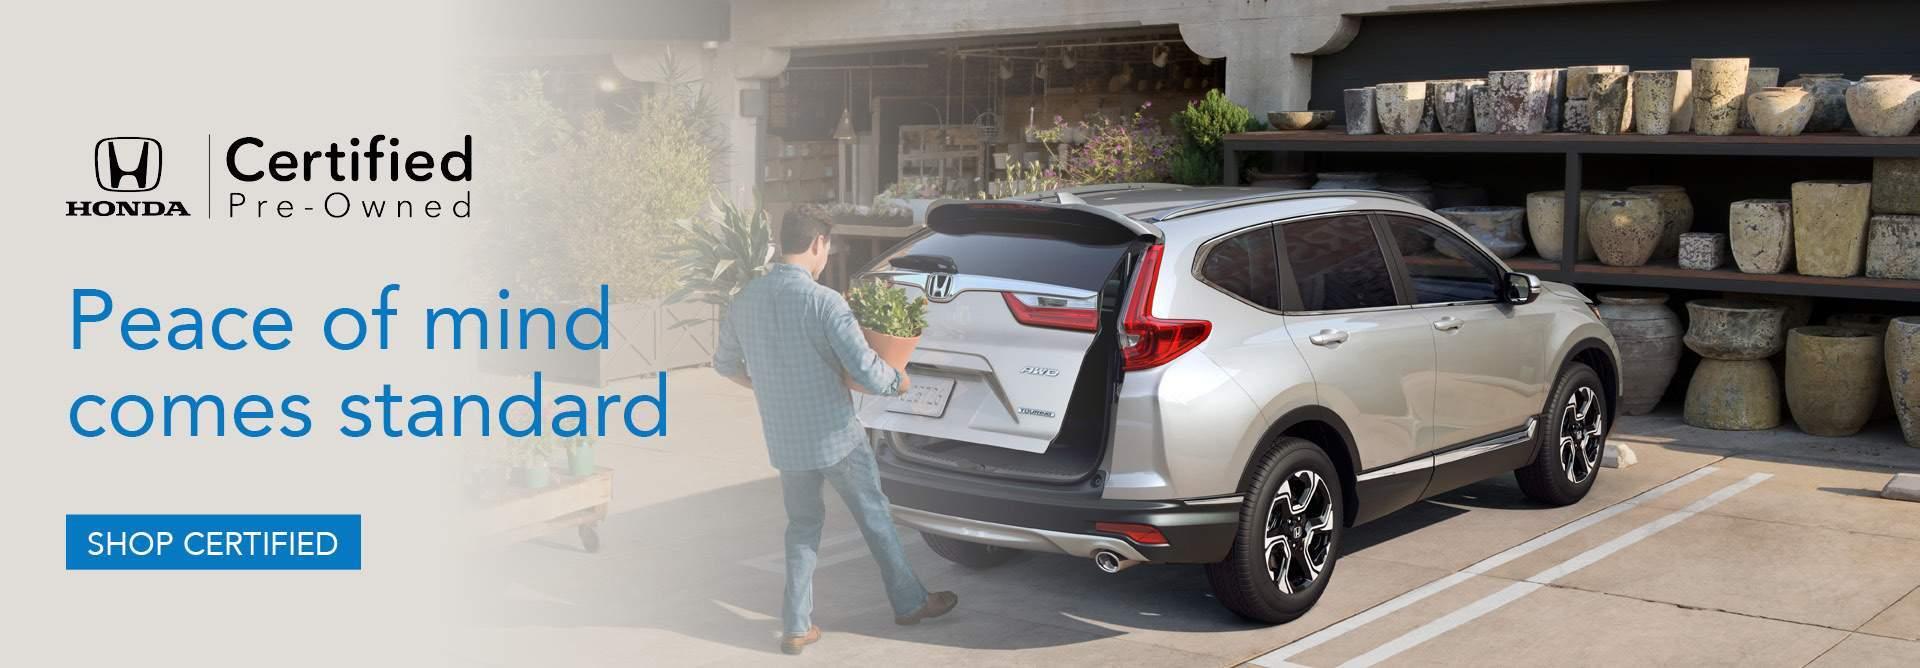 Ny honda dealer new york new preowned cars suffolk for Honda dealership bronx